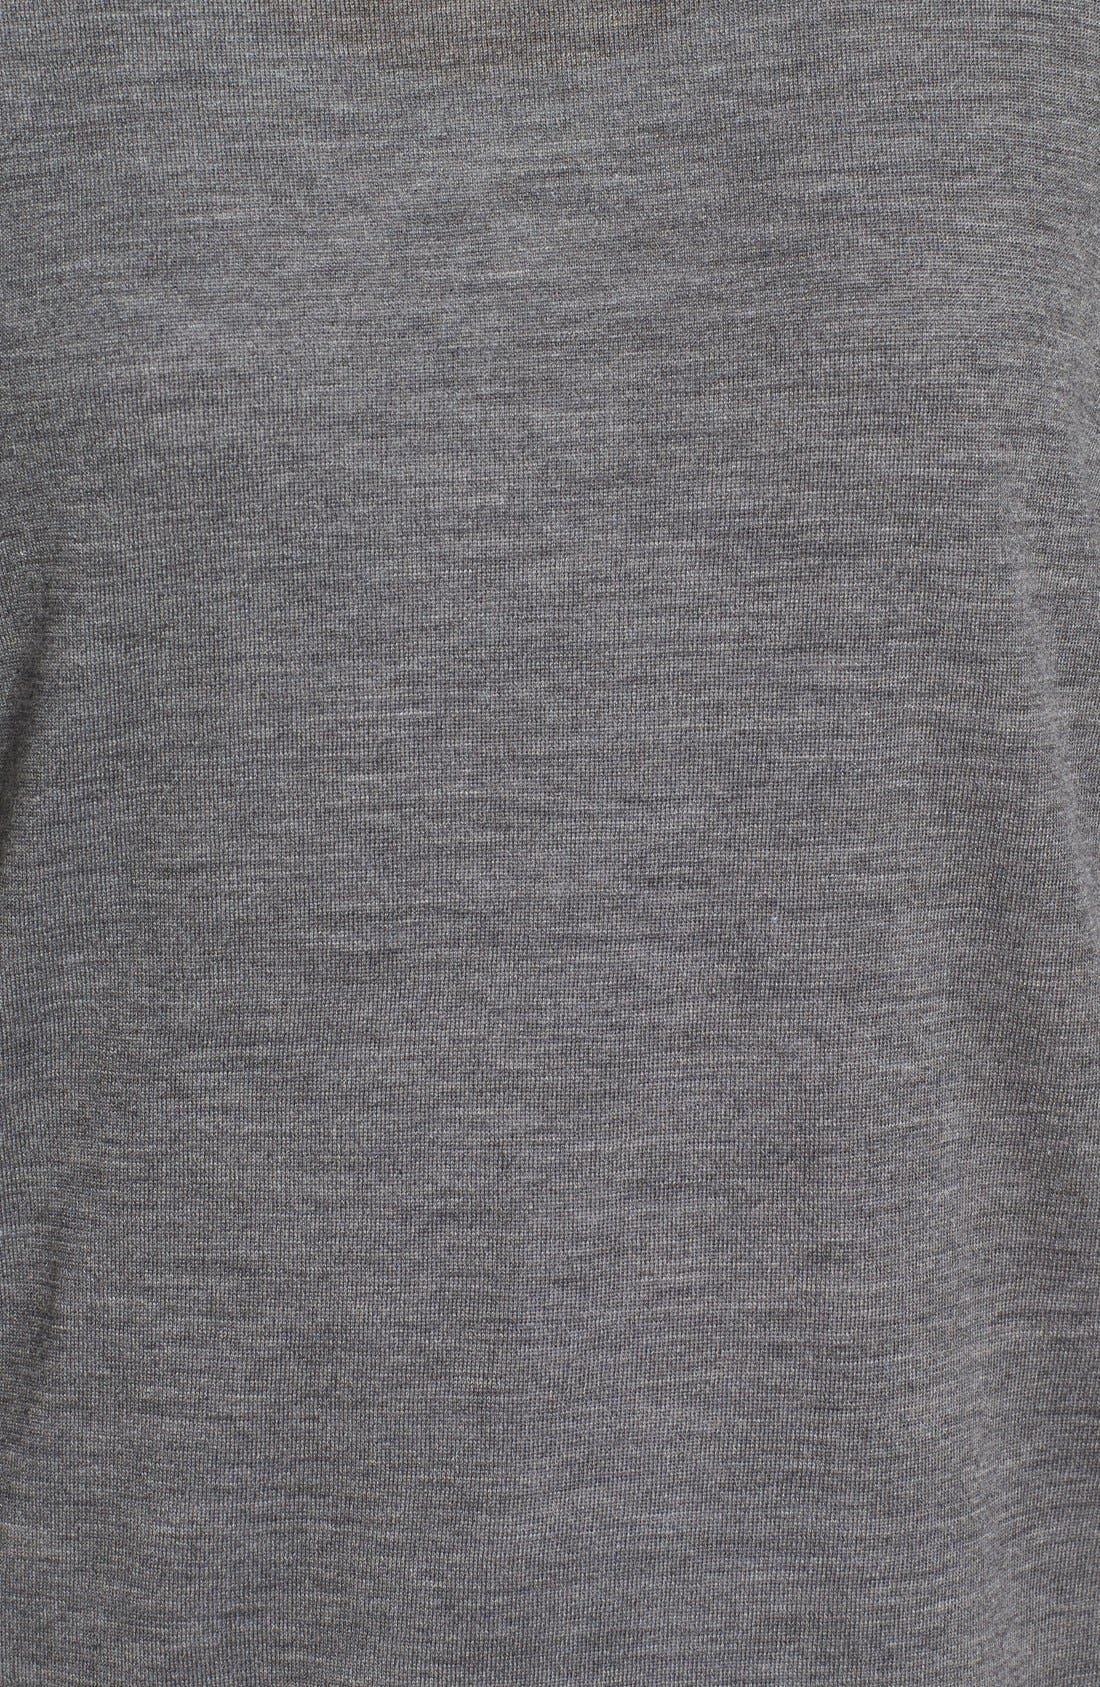 Alternate Image 5  - Eileen Fisher Featherweight Merino Wool Crewneck Sweater